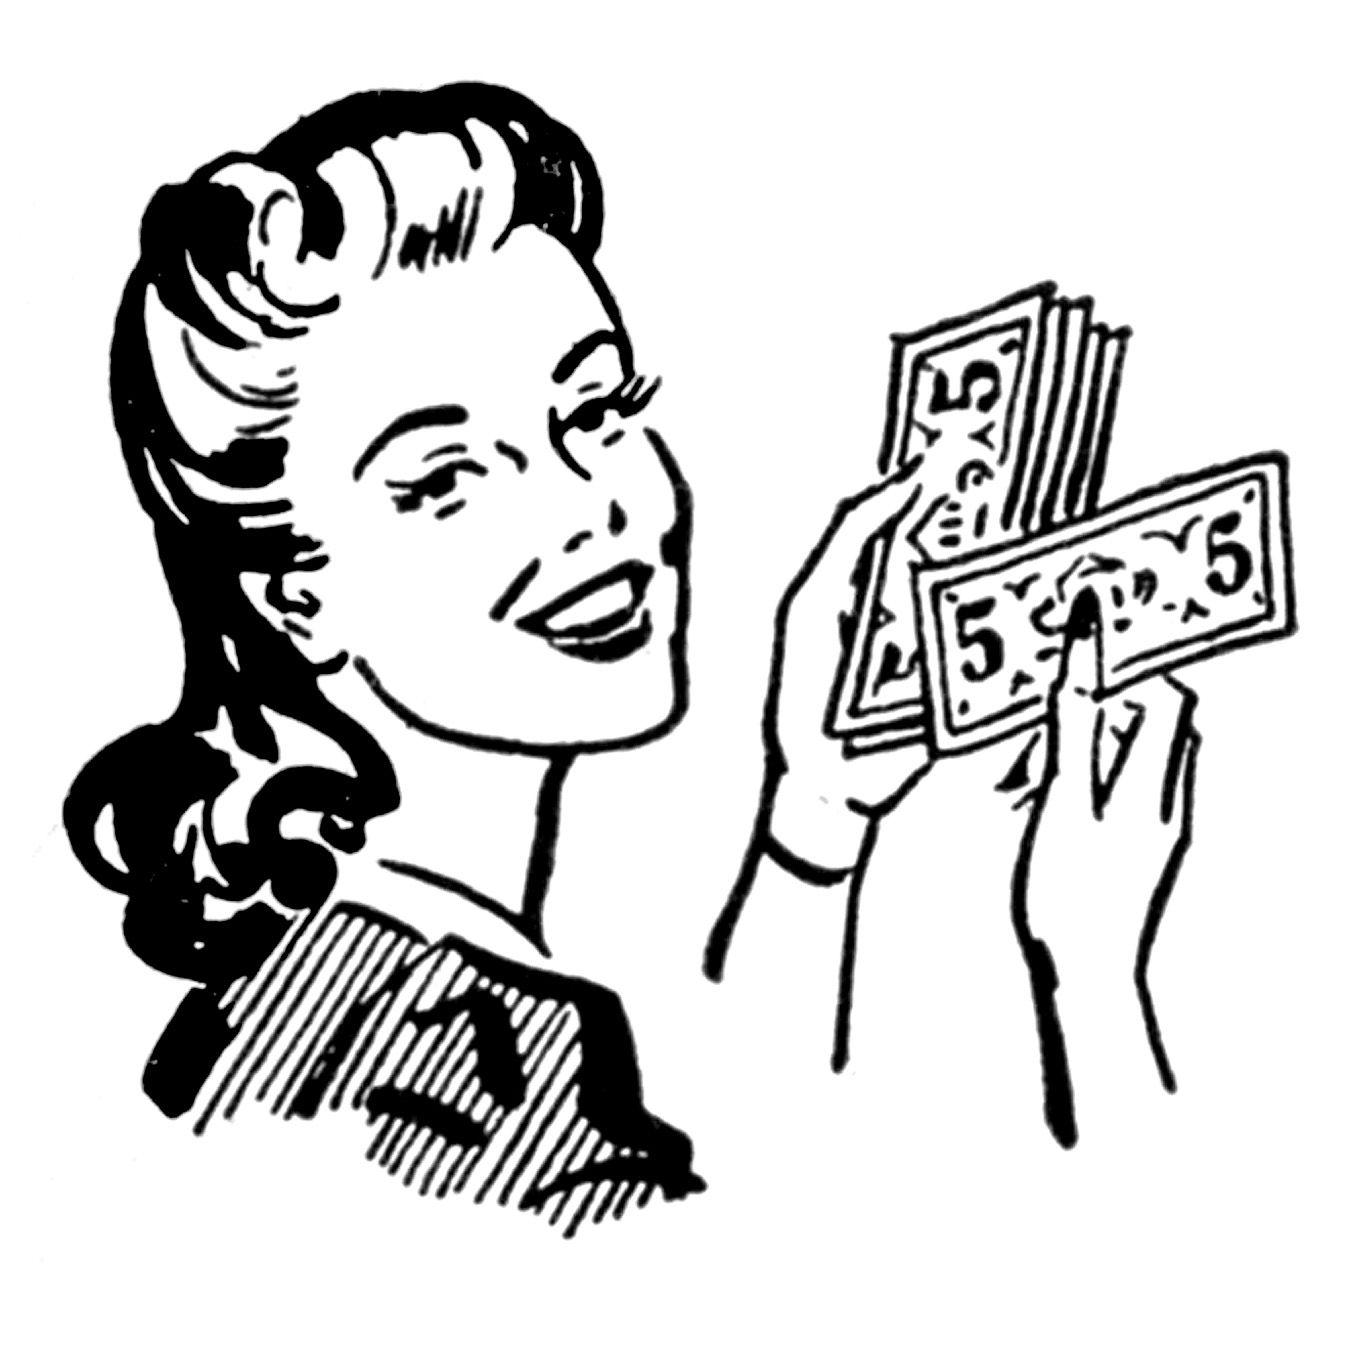 Retro clip art money. Cash clipart black and white